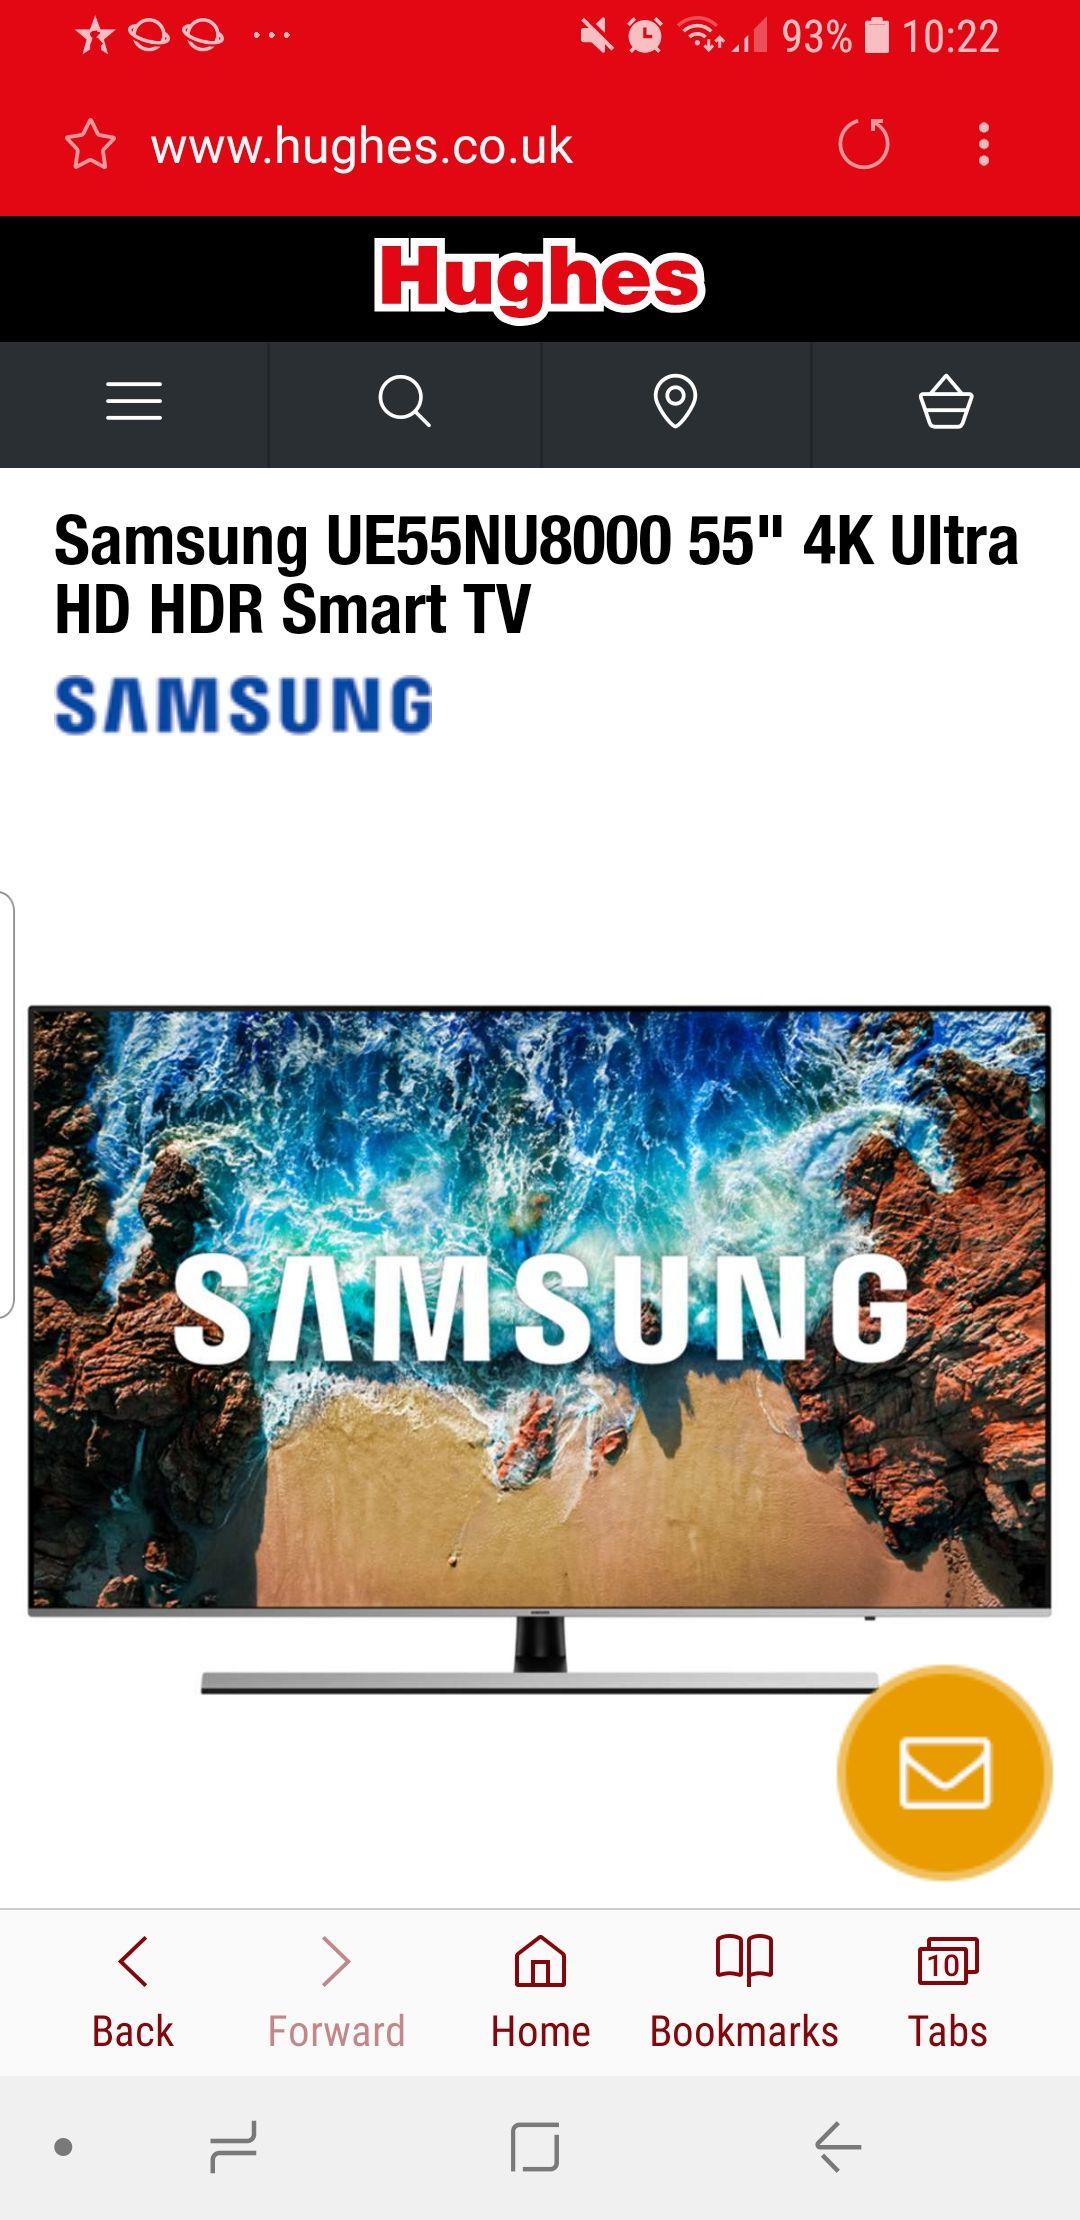 "Cheapest yet? Samsung UE55NU8000 55"" 4K Ultra HD HDR Smart TV £689 @ Hughes"